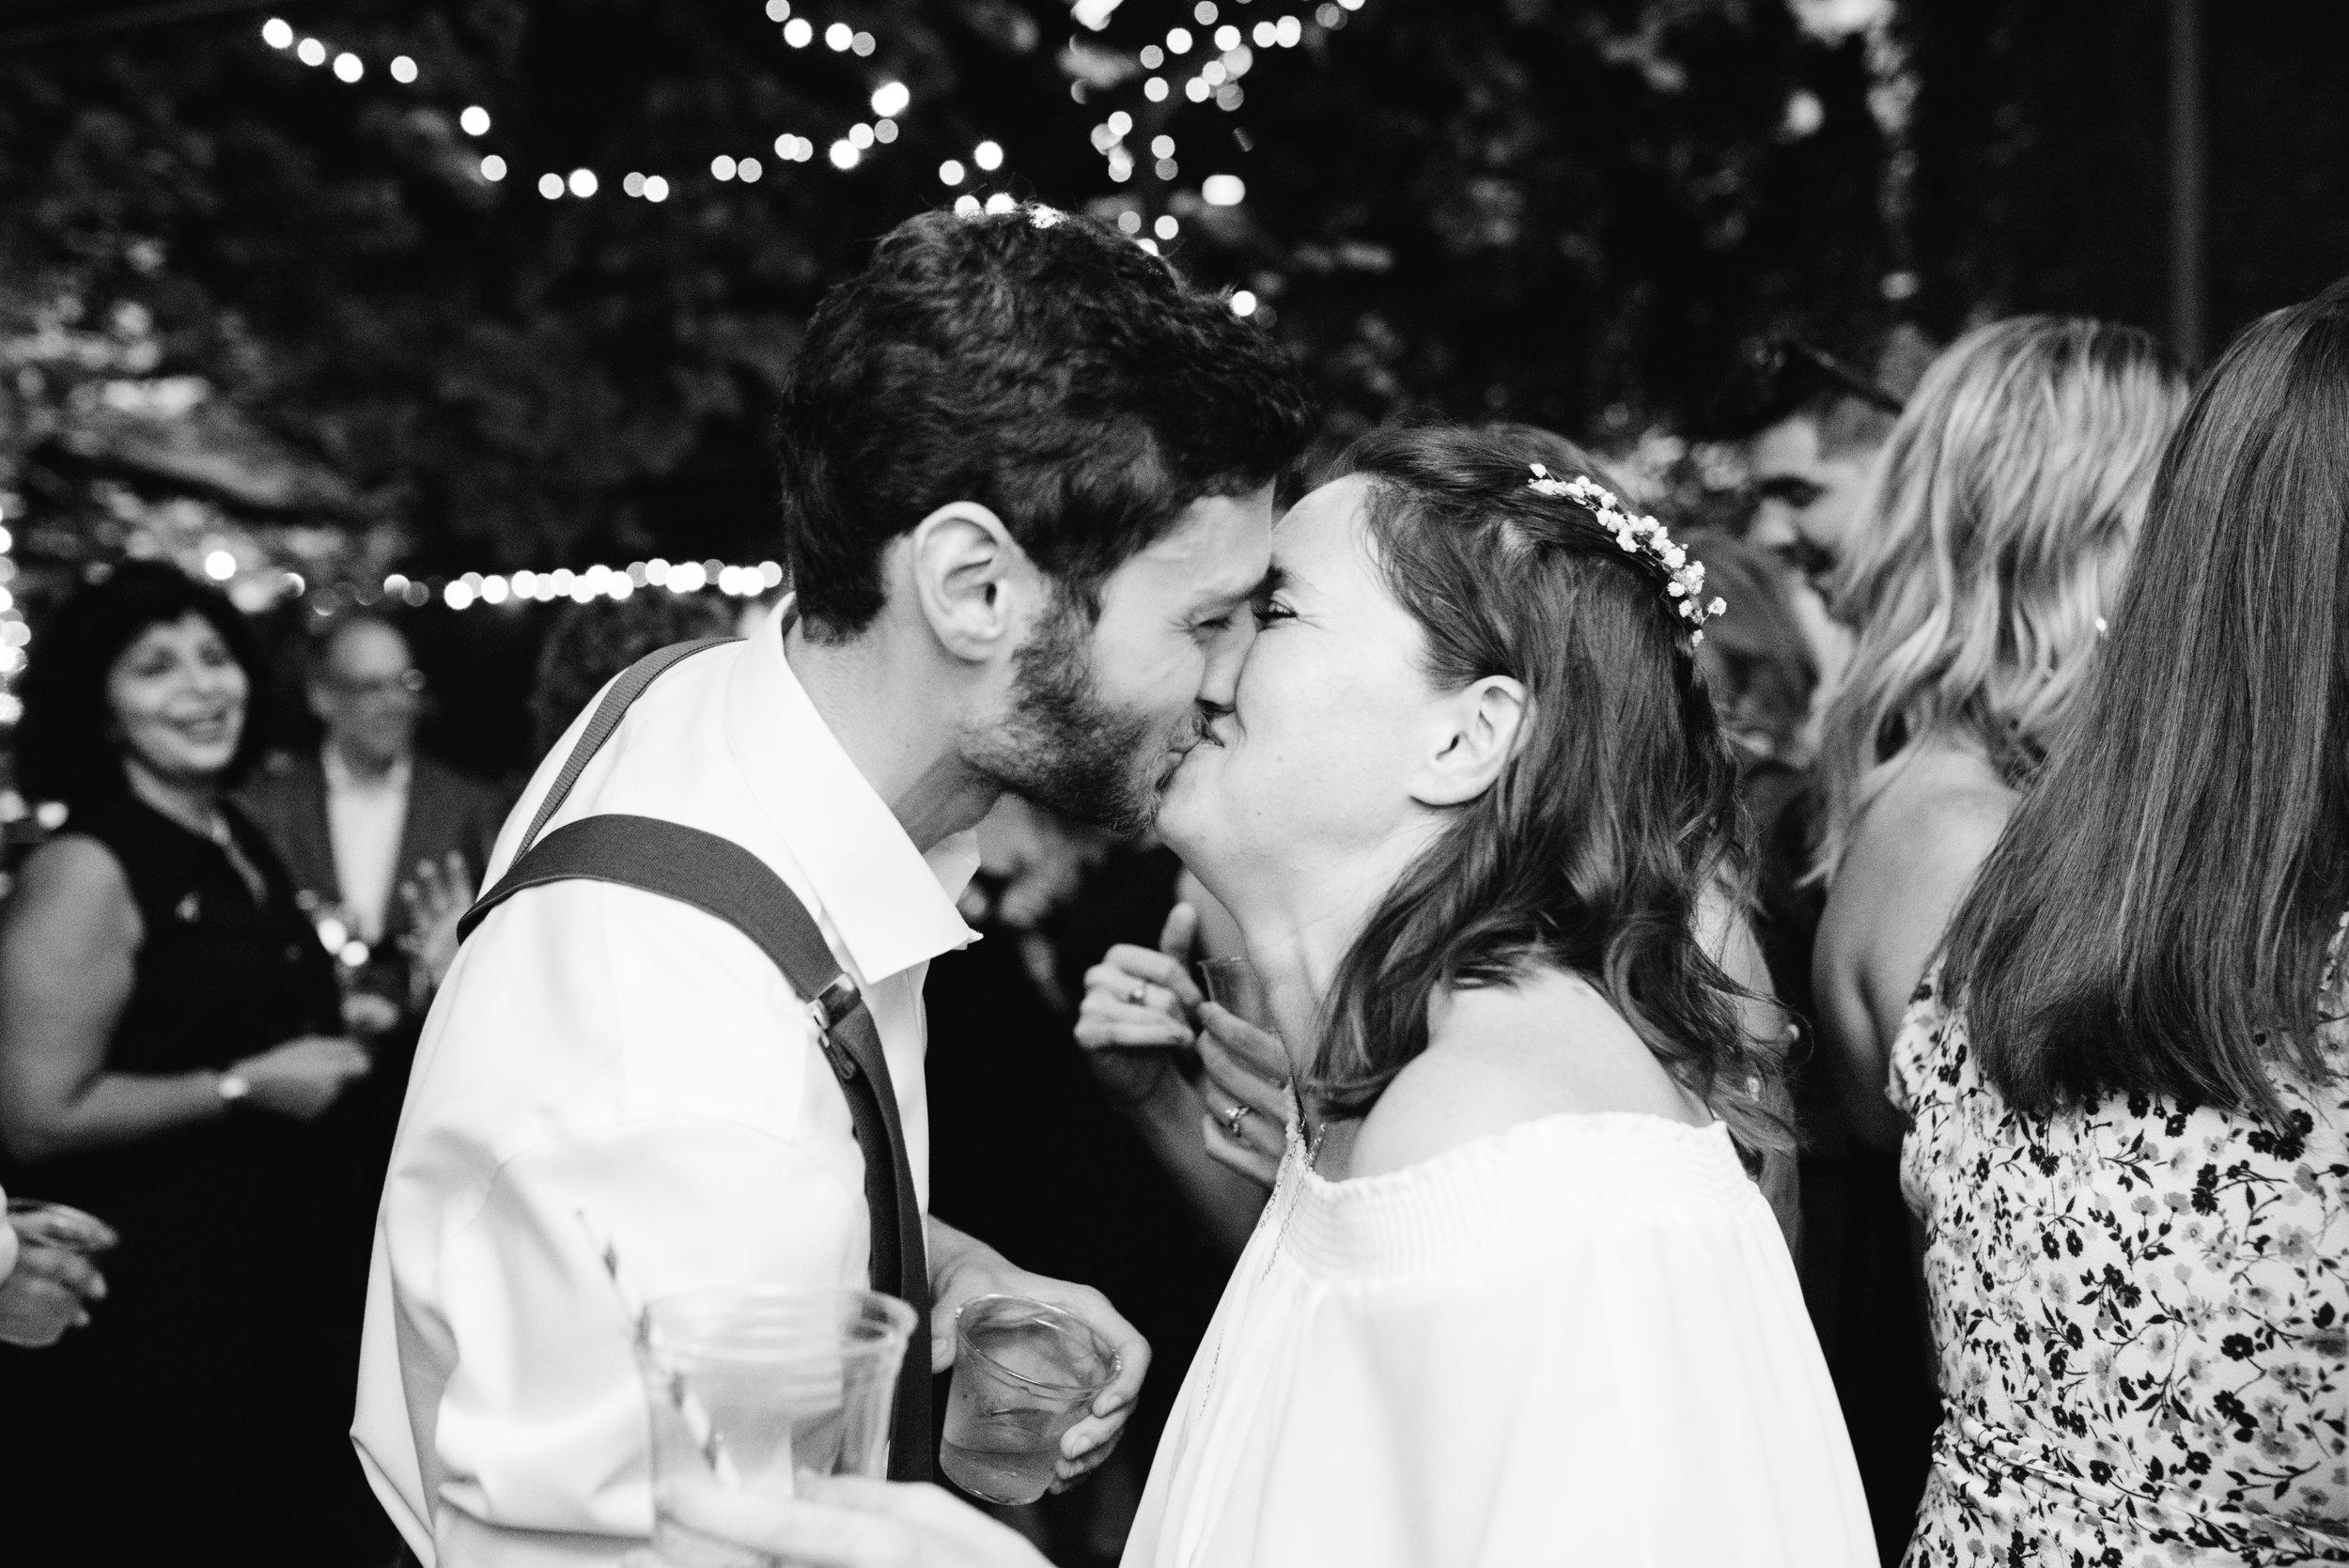 Morning Glory Inn Wedding, Wedding Couples, Wedding Photographer, Mariah Fisher-3.jpg